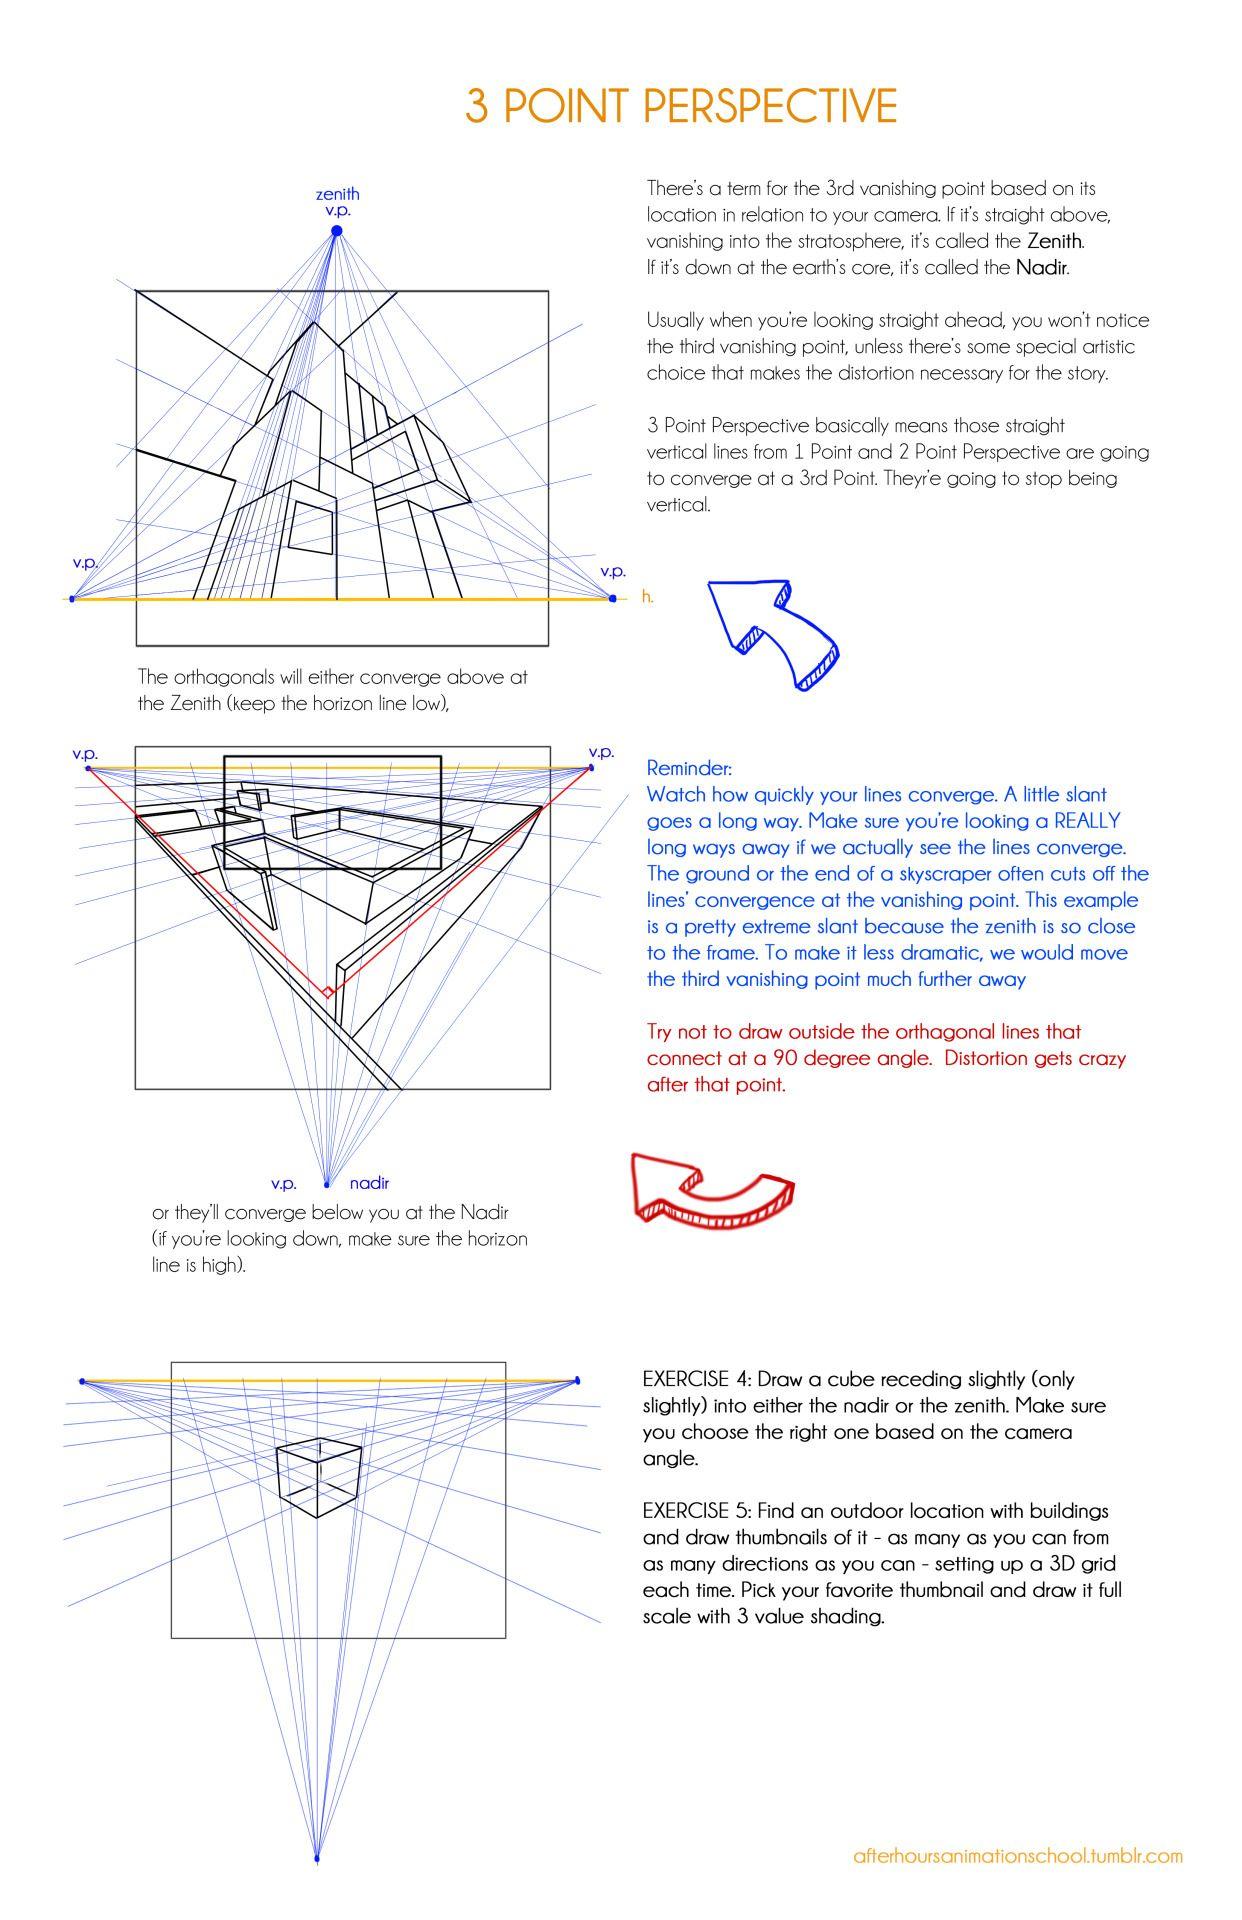 Afterhoursanimationschool 3 Point Perspective